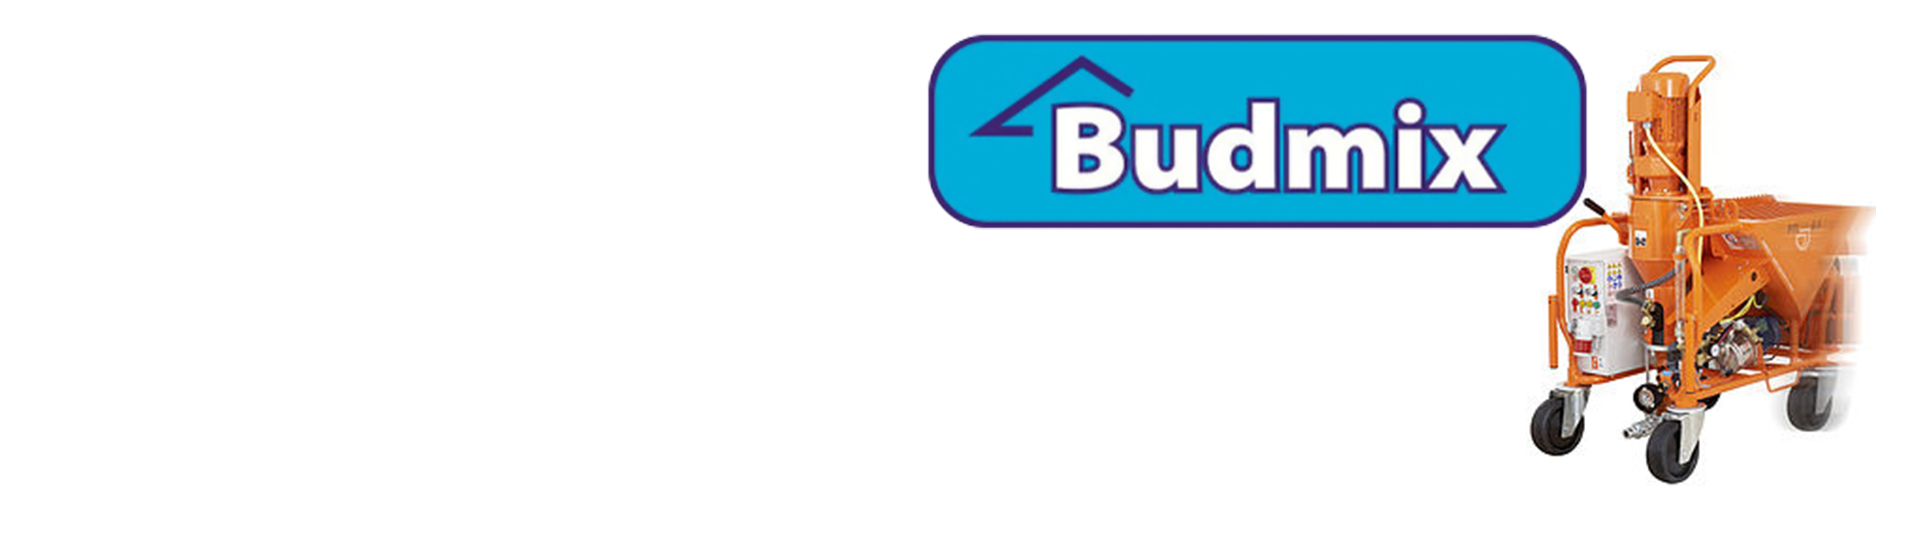 Budmix